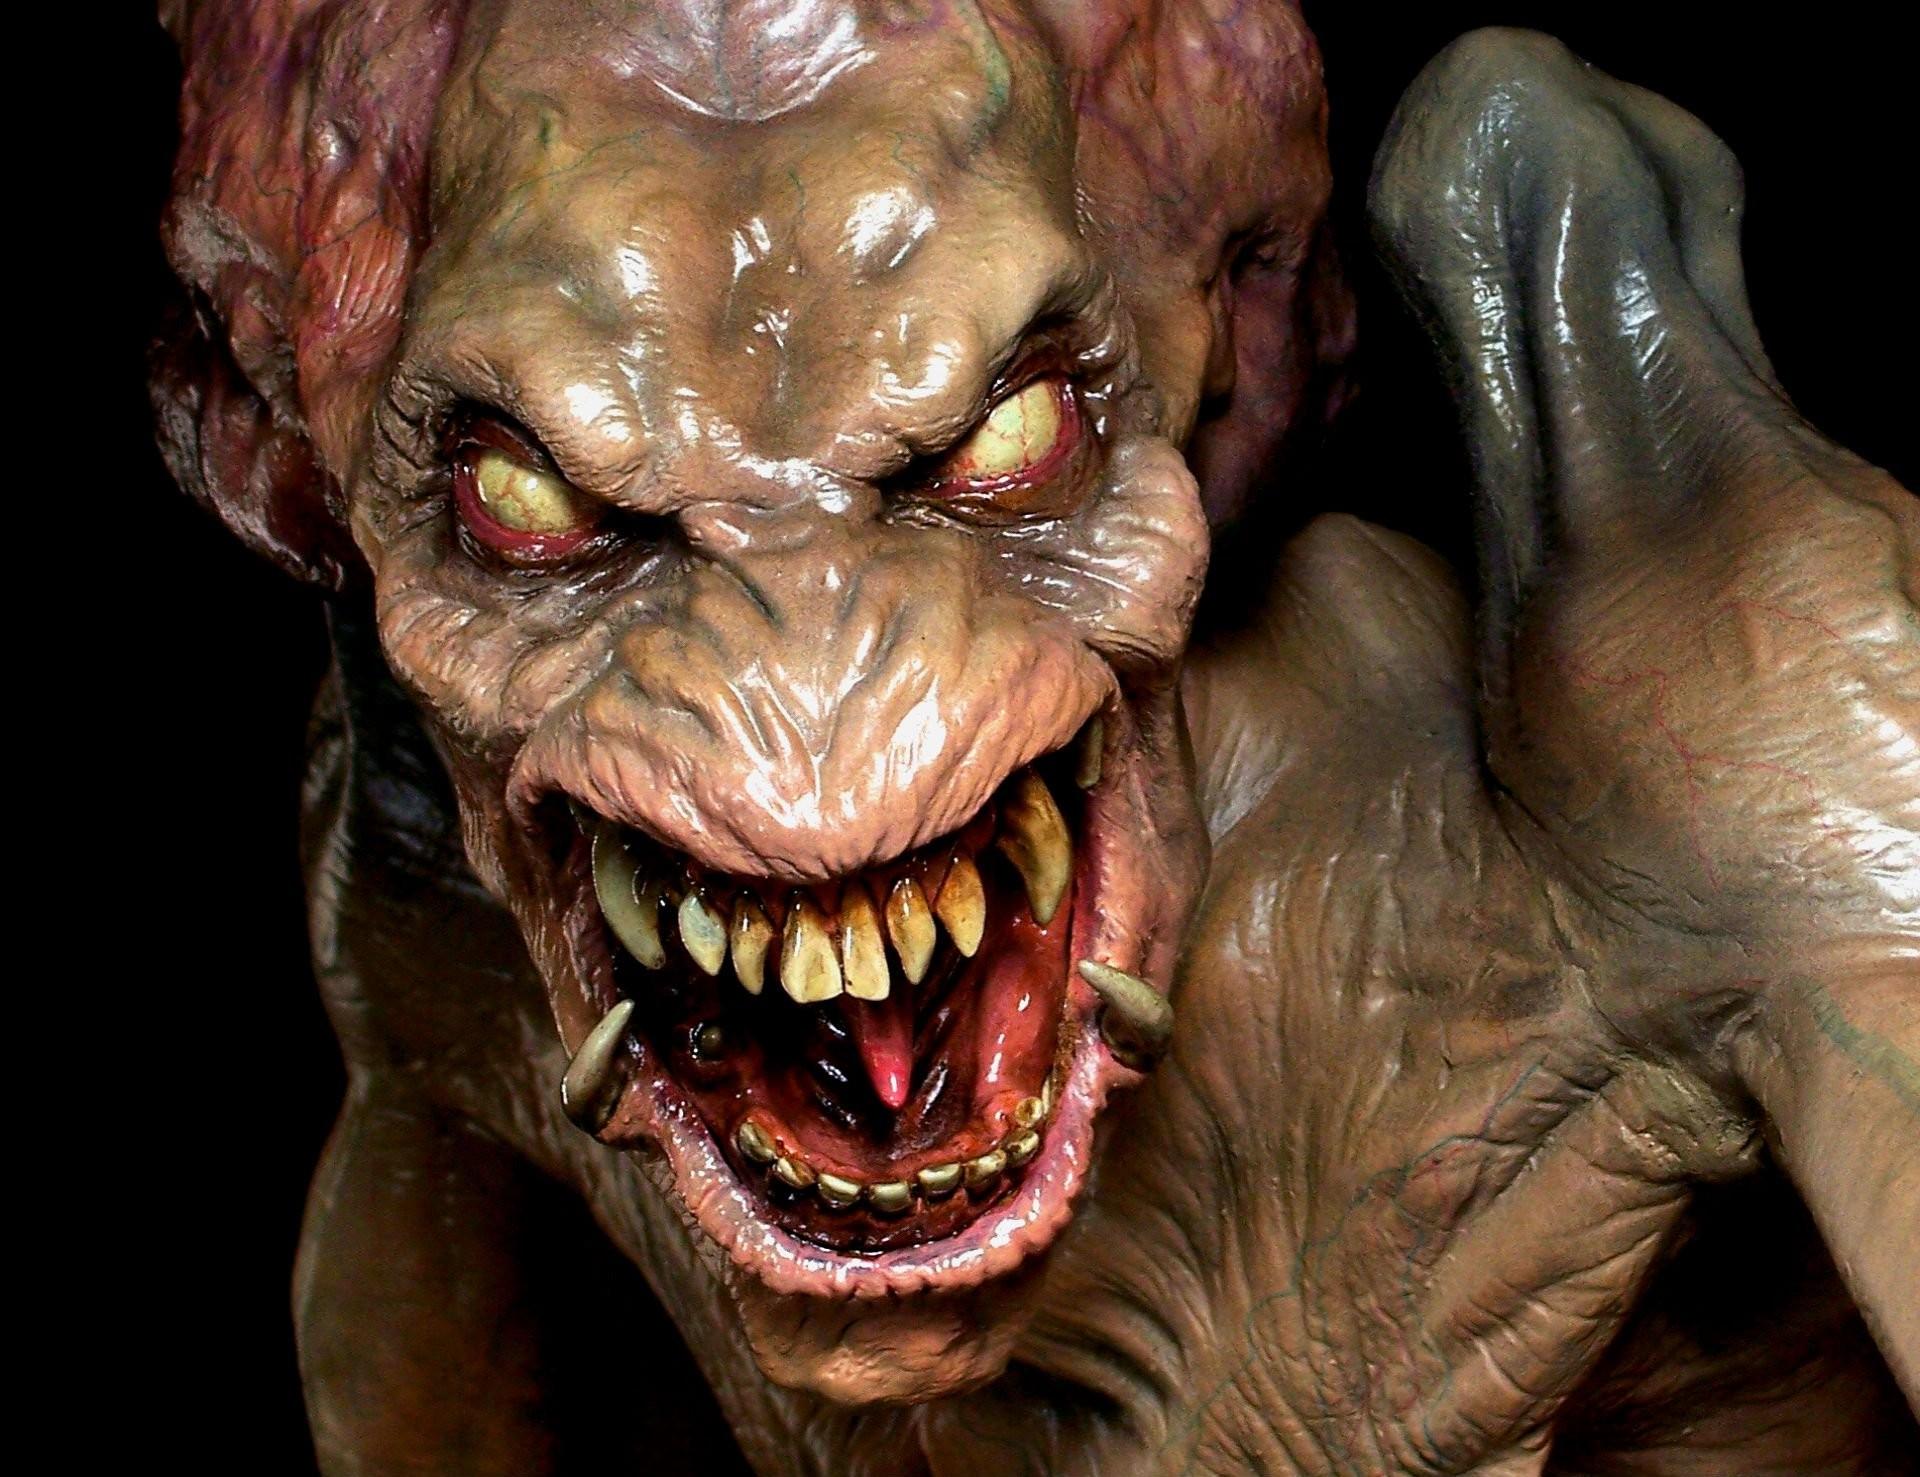 horror movie monsters | PUMPKINHEAD horror movie film dark monster halloween  wallpaper .